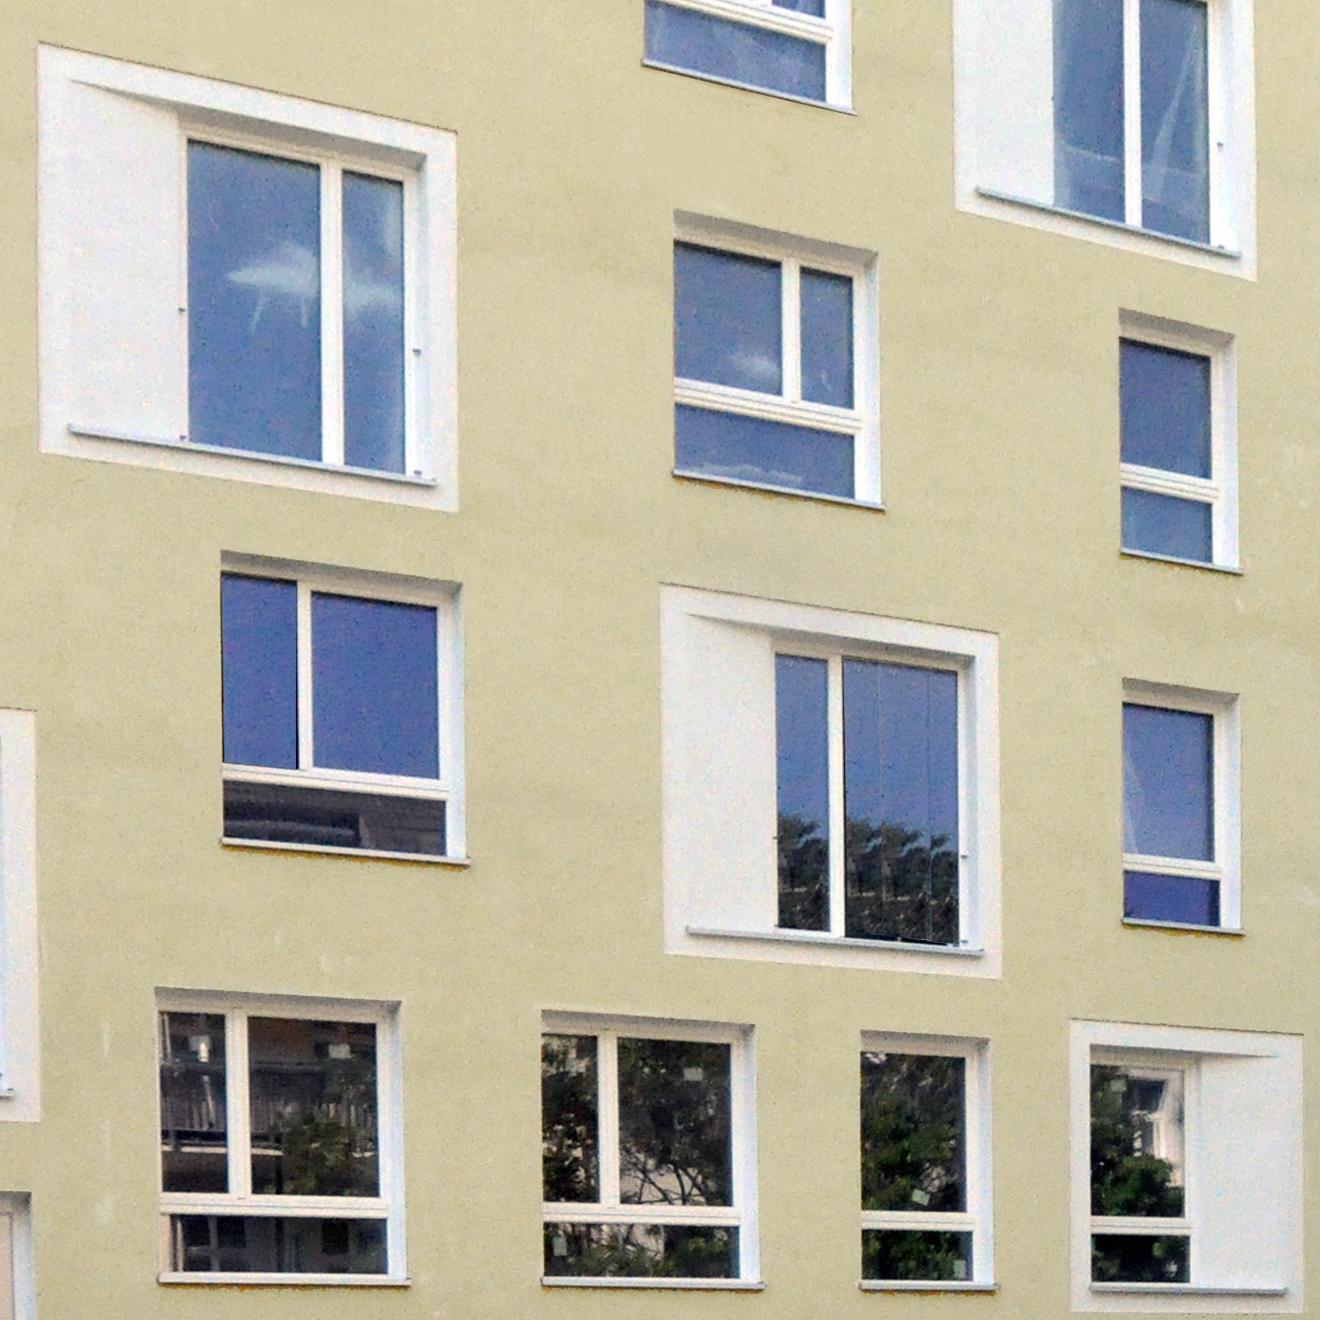 Mehrfamilienhaus baugruppe 2 kreuzberg de architekten for Mehrfamilienhaus berlin